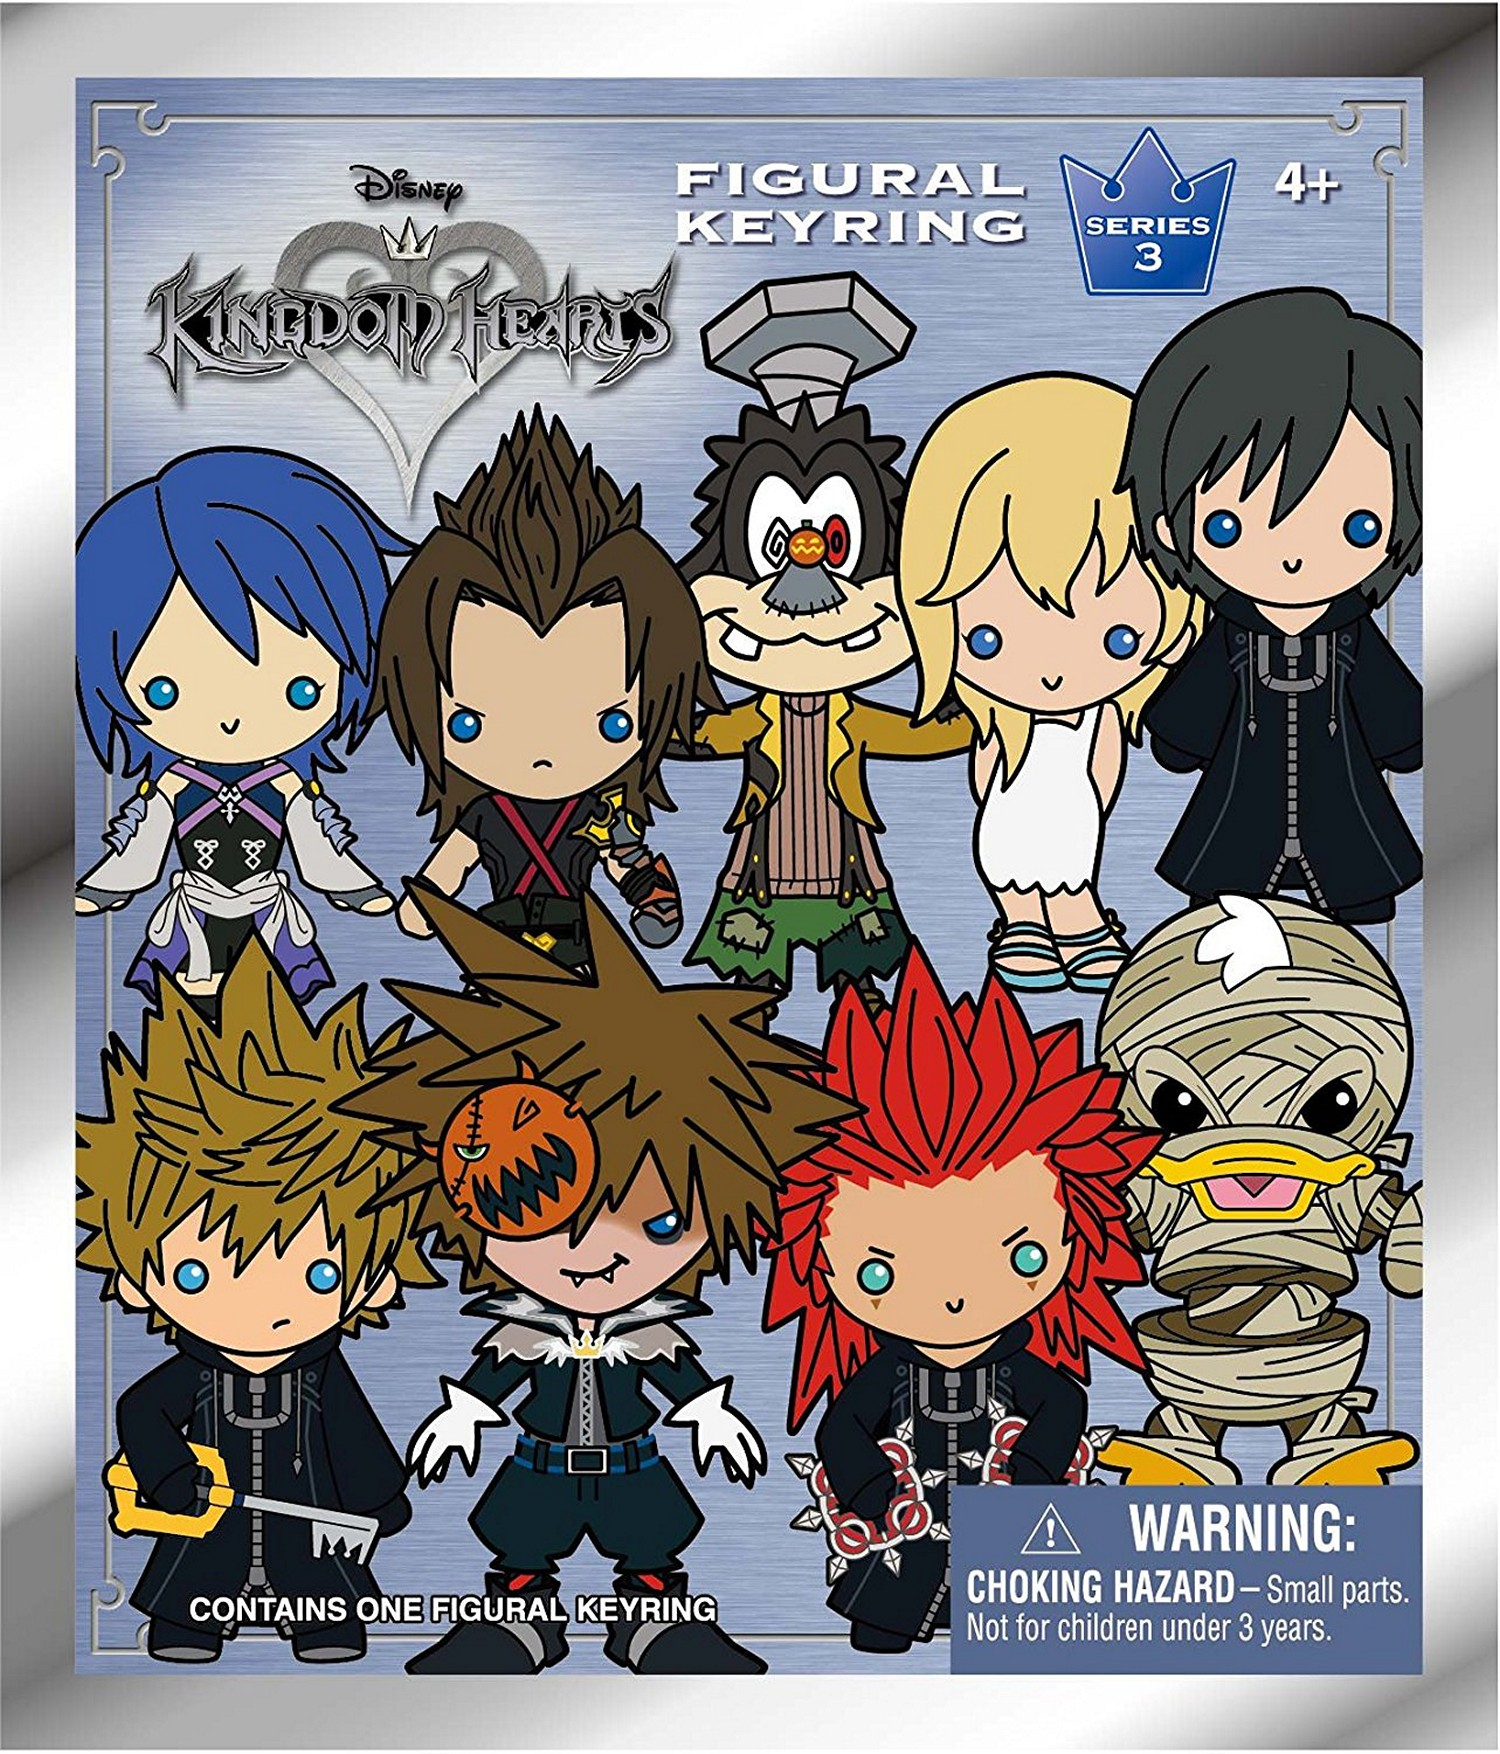 Monogram Disney Kingdom Hearts Keychain 3D Figural Keyring Series 2 /& 3